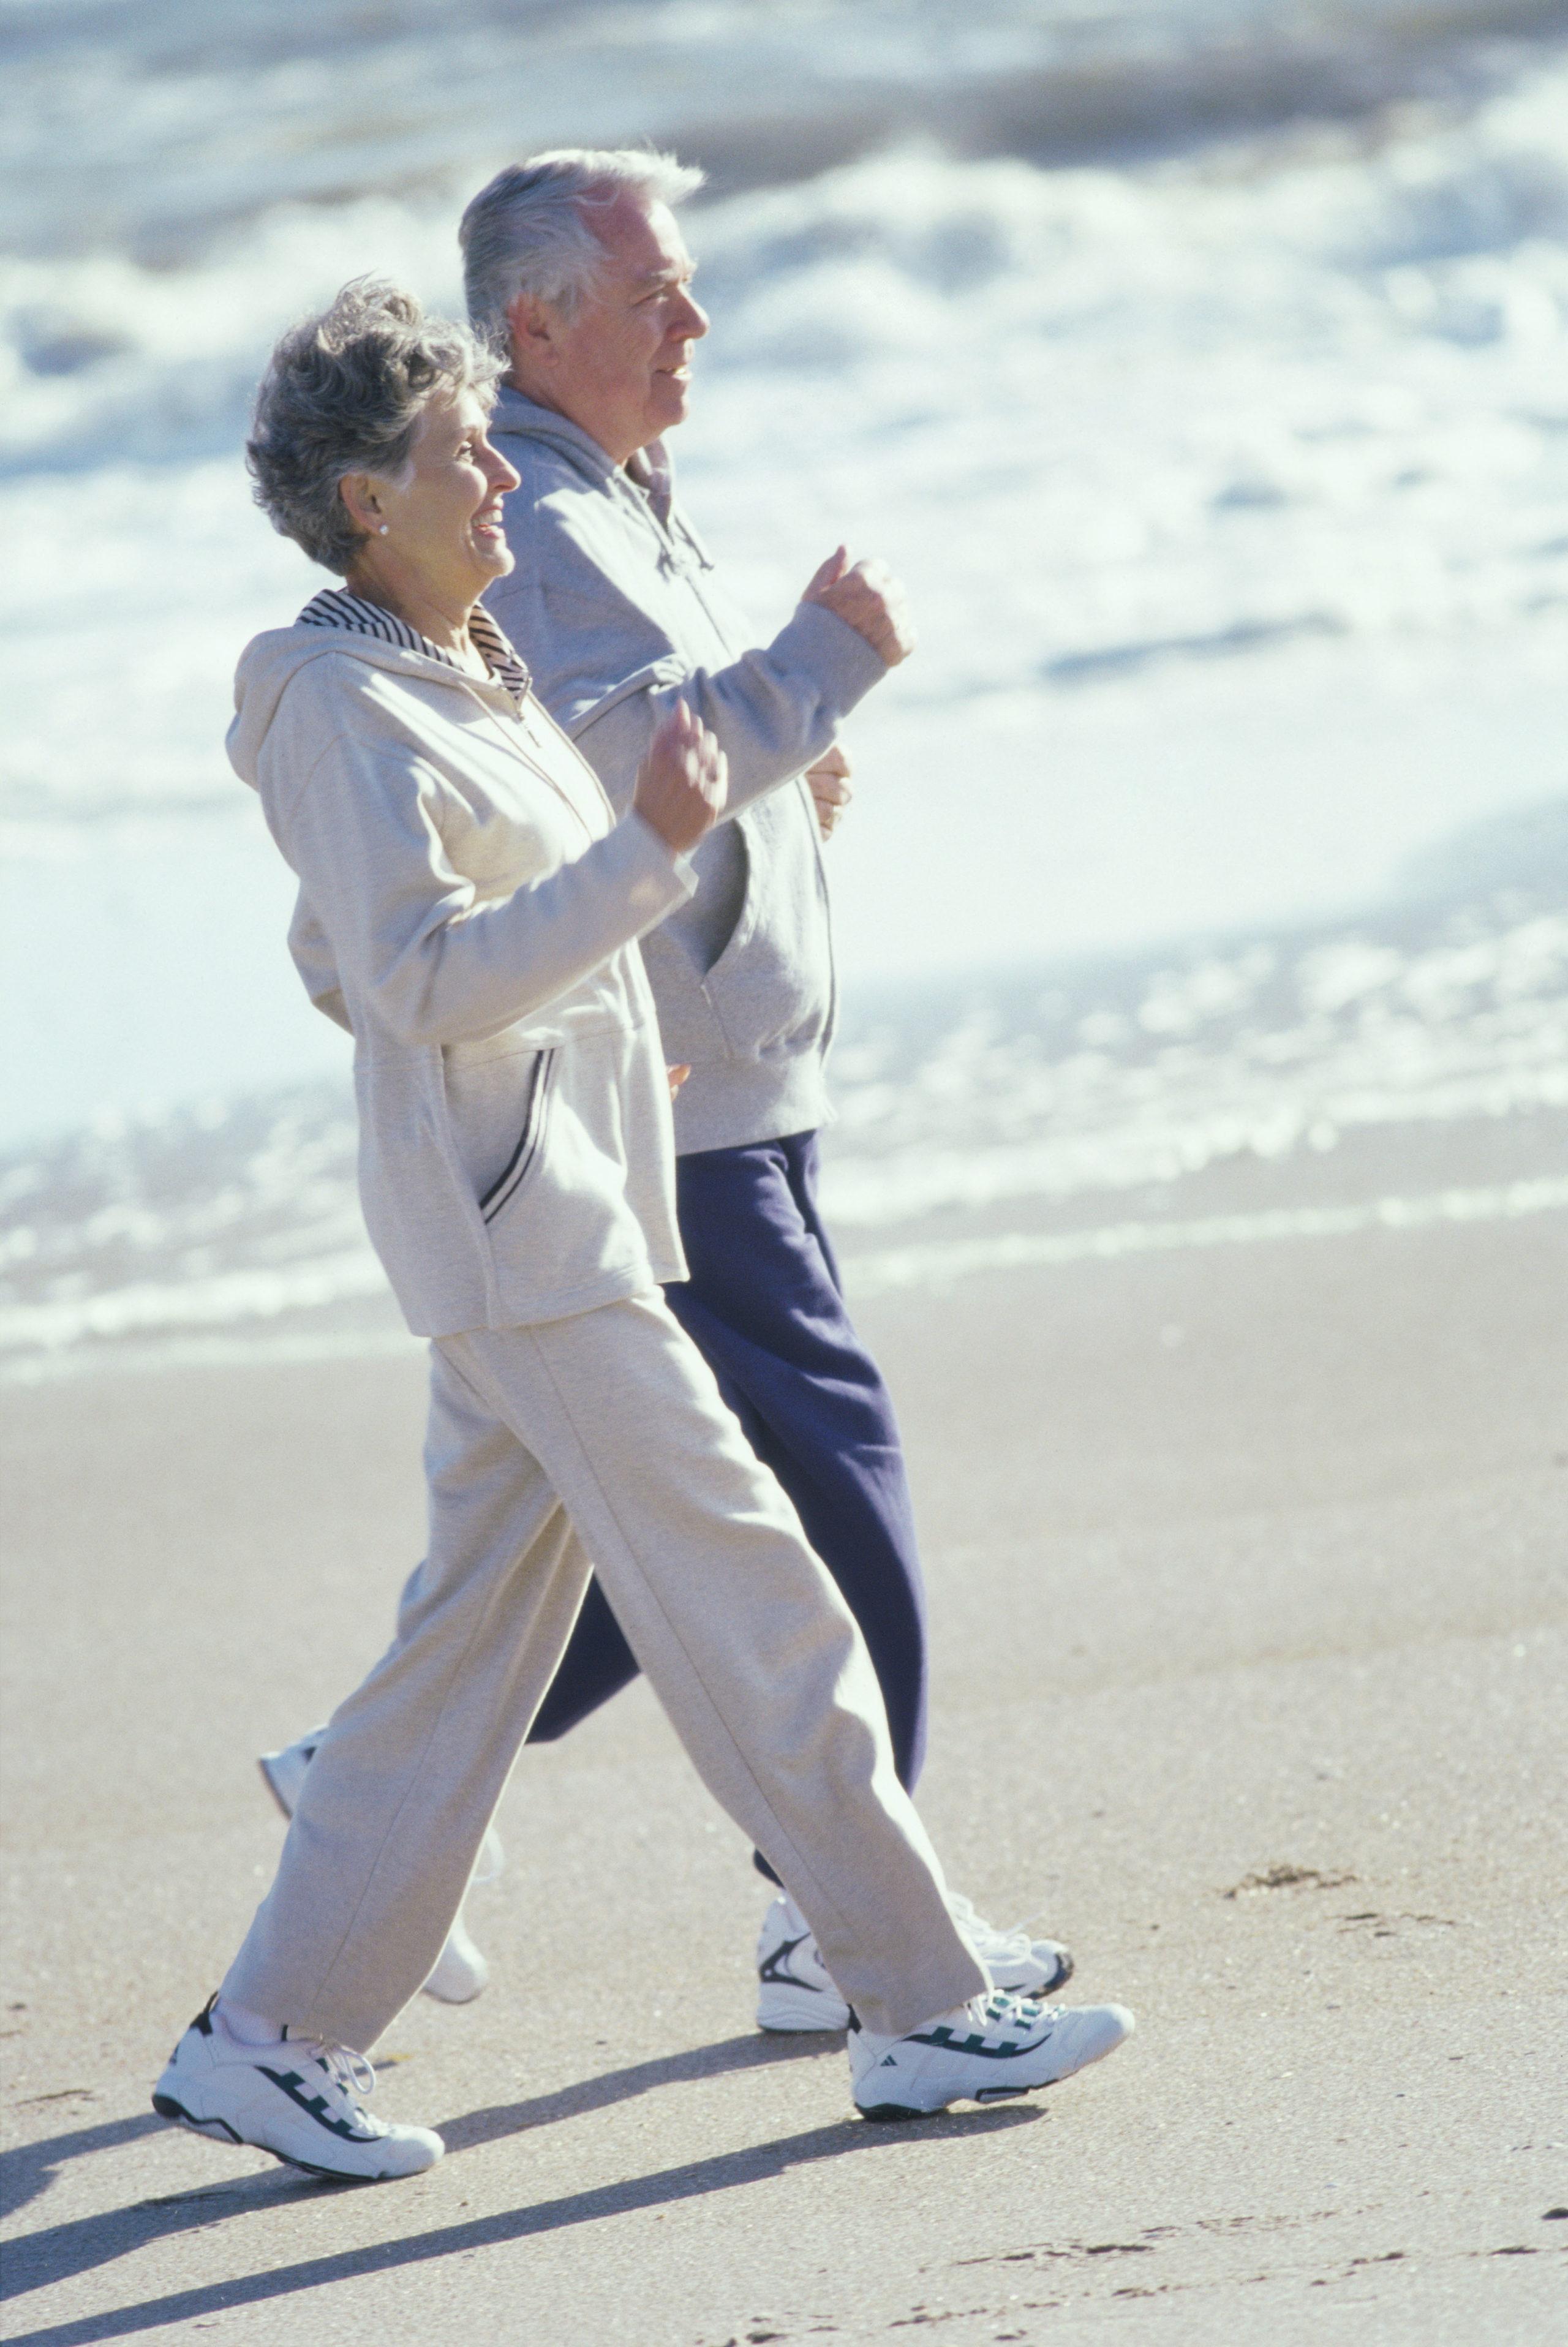 Senioren joggen am Strand